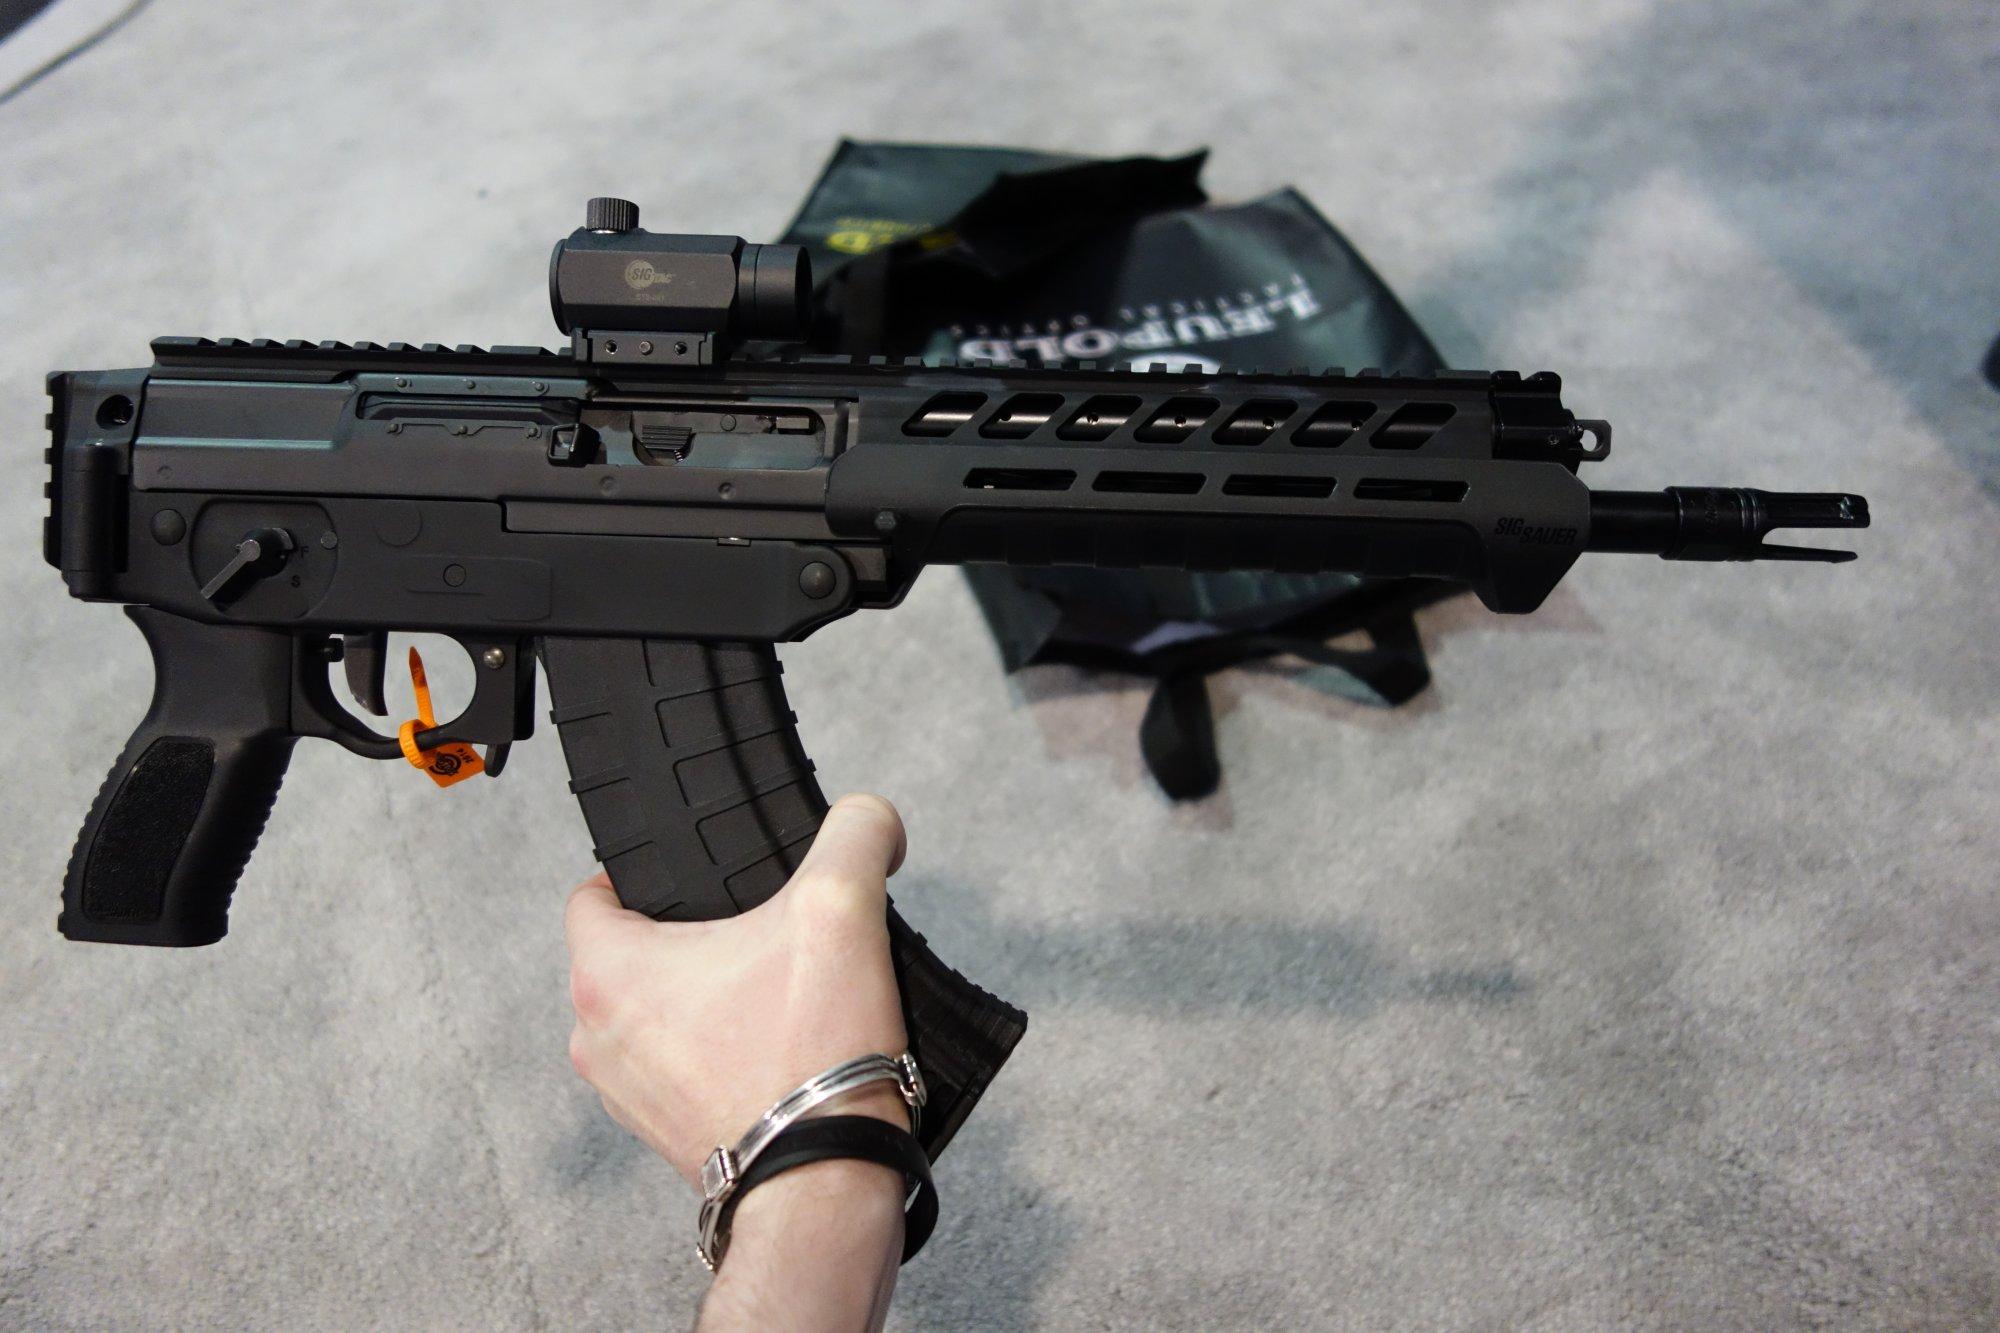 SIG SAUER SIG556xi 7.62x39mm Russian Configuration Semi Auto Only Modular Multi Caliber Combat Tactical Carbine Kalashnikov AK 47 AKM SHOT Show 2014 1 15 14 David Crane DefenseReview.com DR 13 SIG SAUER SIG556xi Modular, Multi Caliber (5.56mm NATO, 300 AAC Blackout/300BLK, 7.62x39mm Russian) Gas Piston/Op Rod Combat/Tactical Rifle/Carbine/SBR with Kalashnikov AK 47/AKM Configuration Capability!